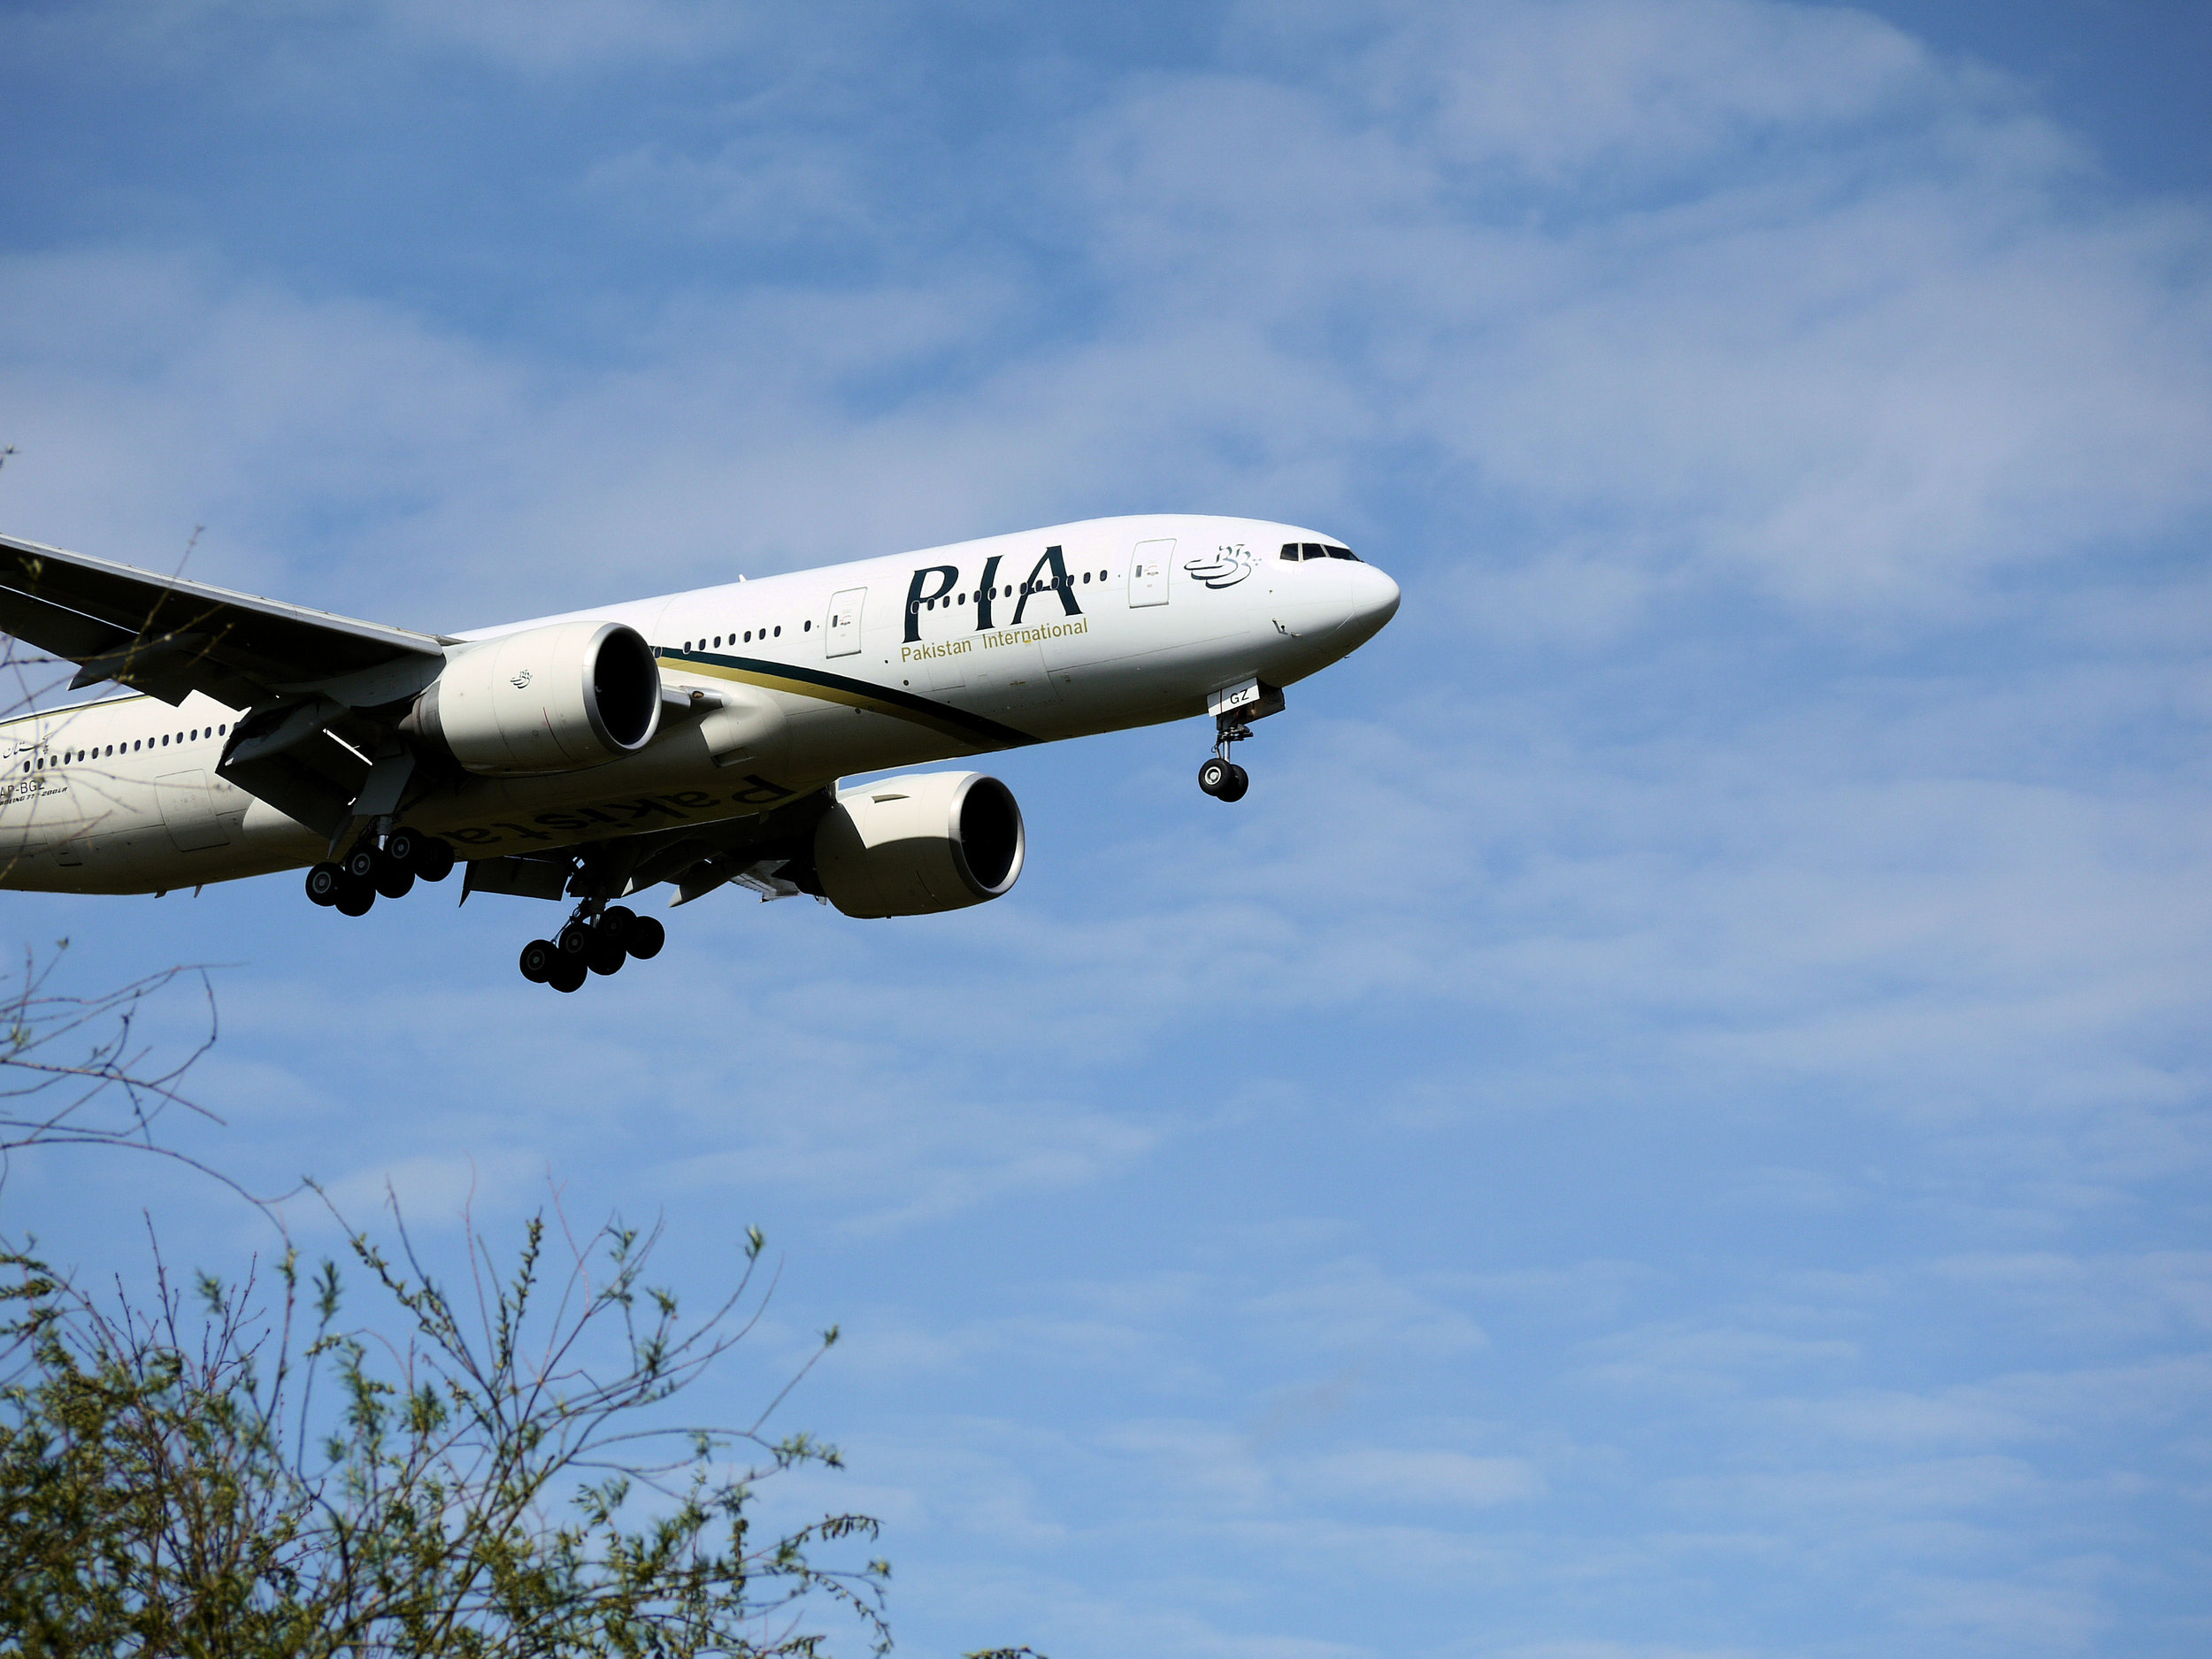 Pakistani International Airways flight landing, Manchester, 2012. Photograph by Smabs Sputzer/Flickr/Creative Commons.